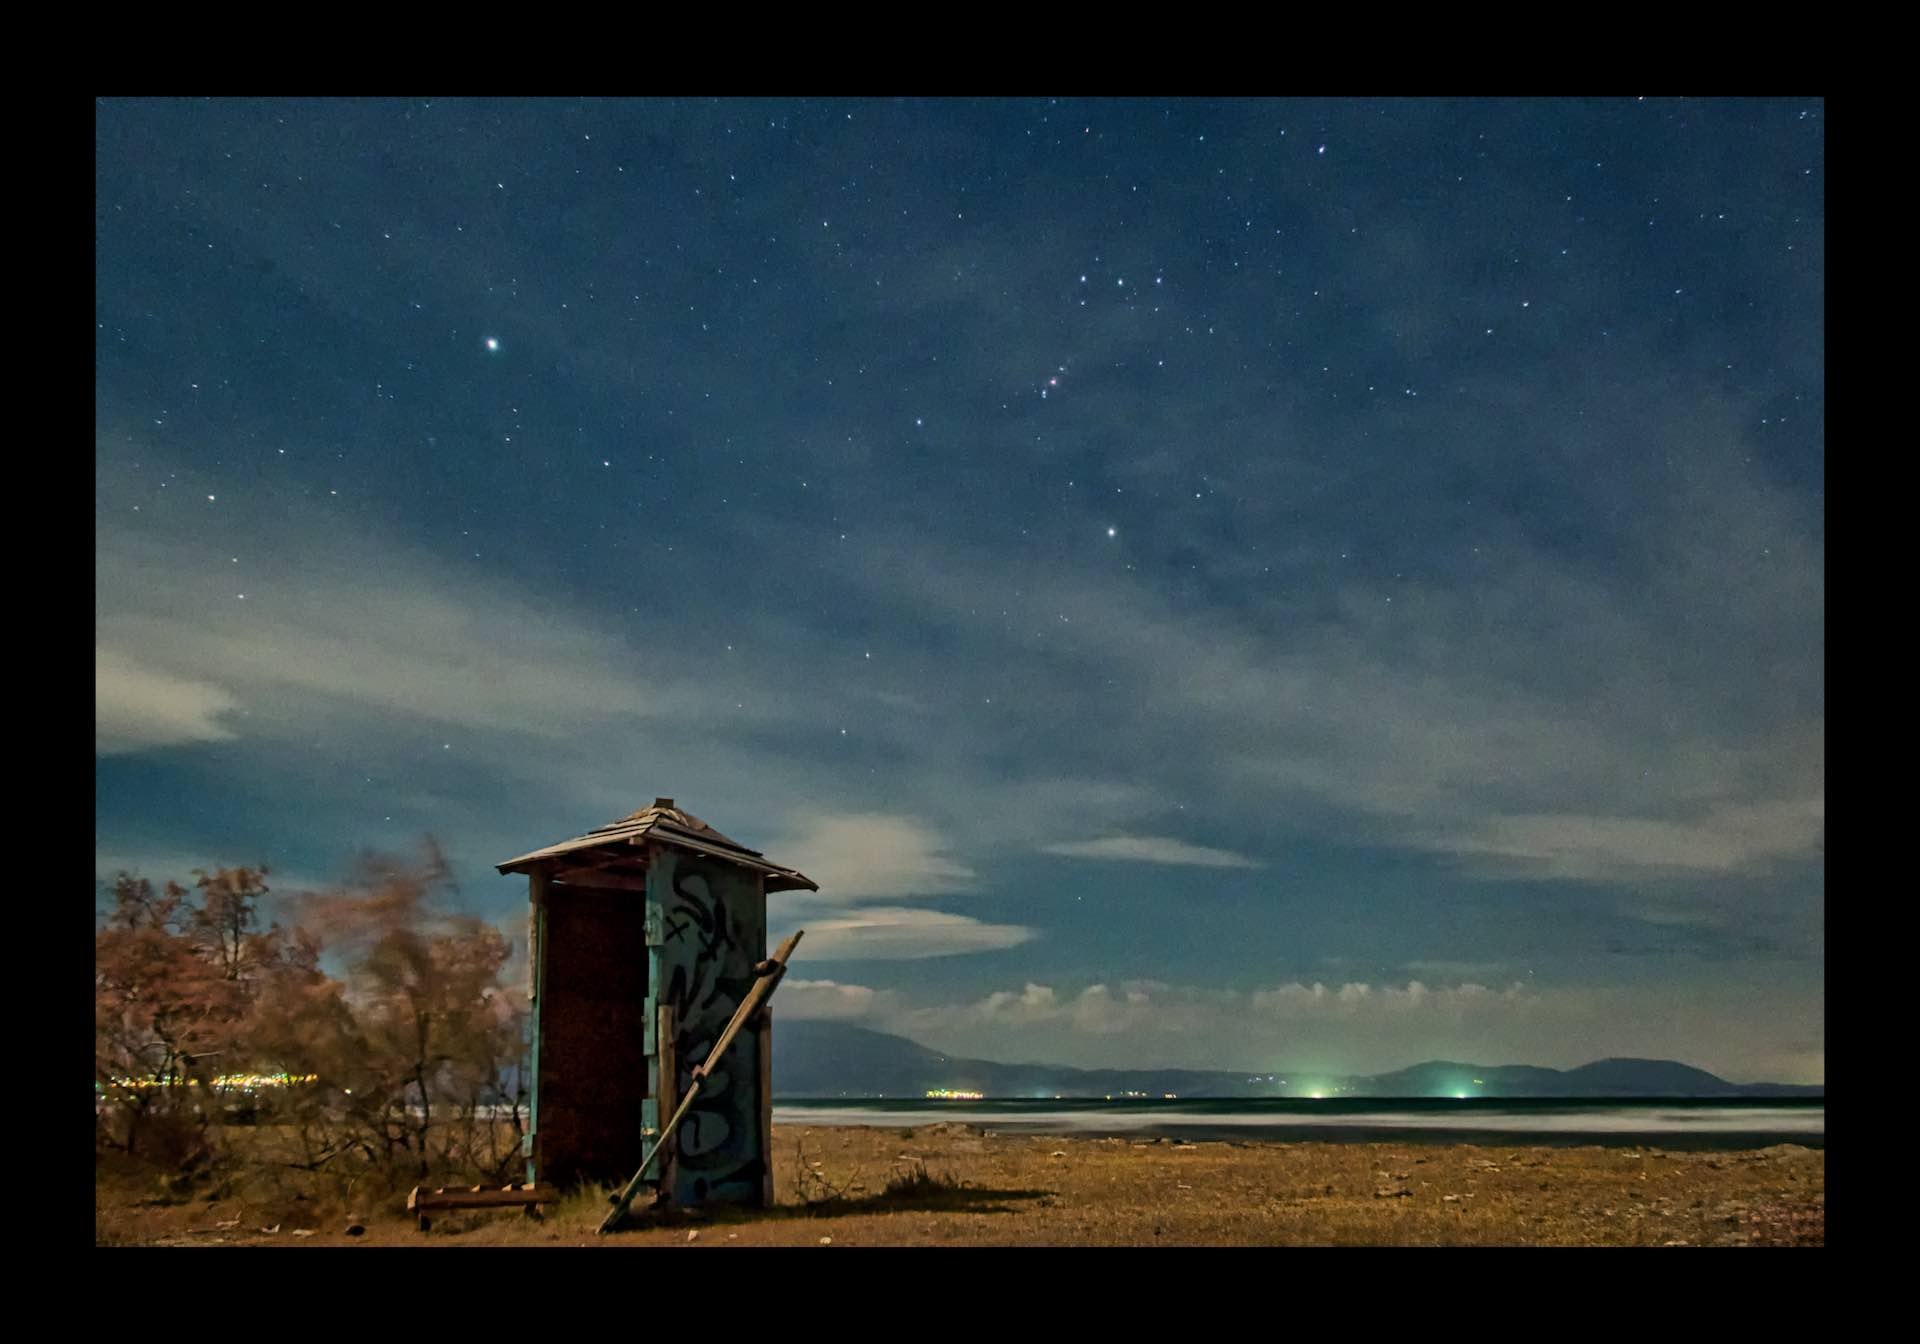 Starry Night (Landscape under the Moonlight)